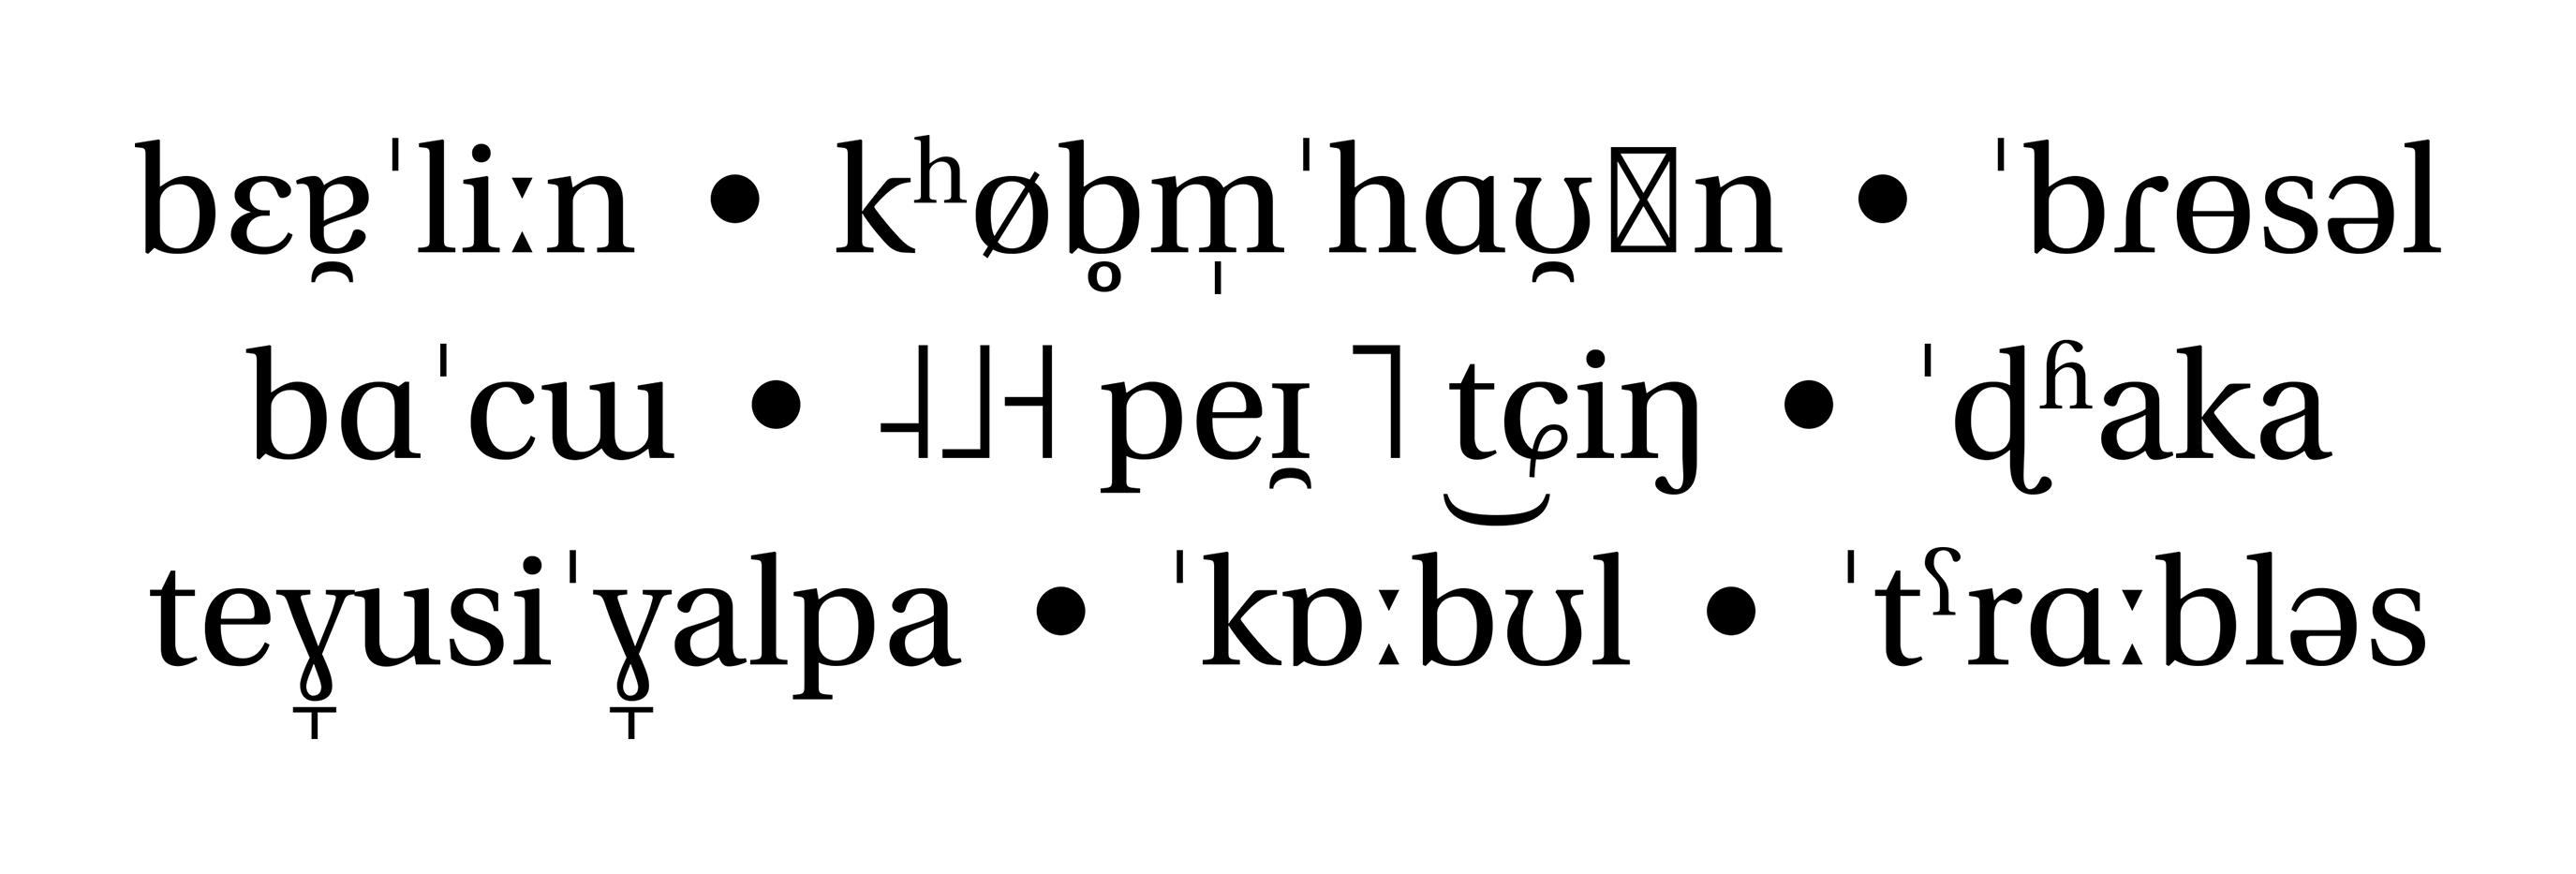 IPA-Schriftmuster der Heuristica